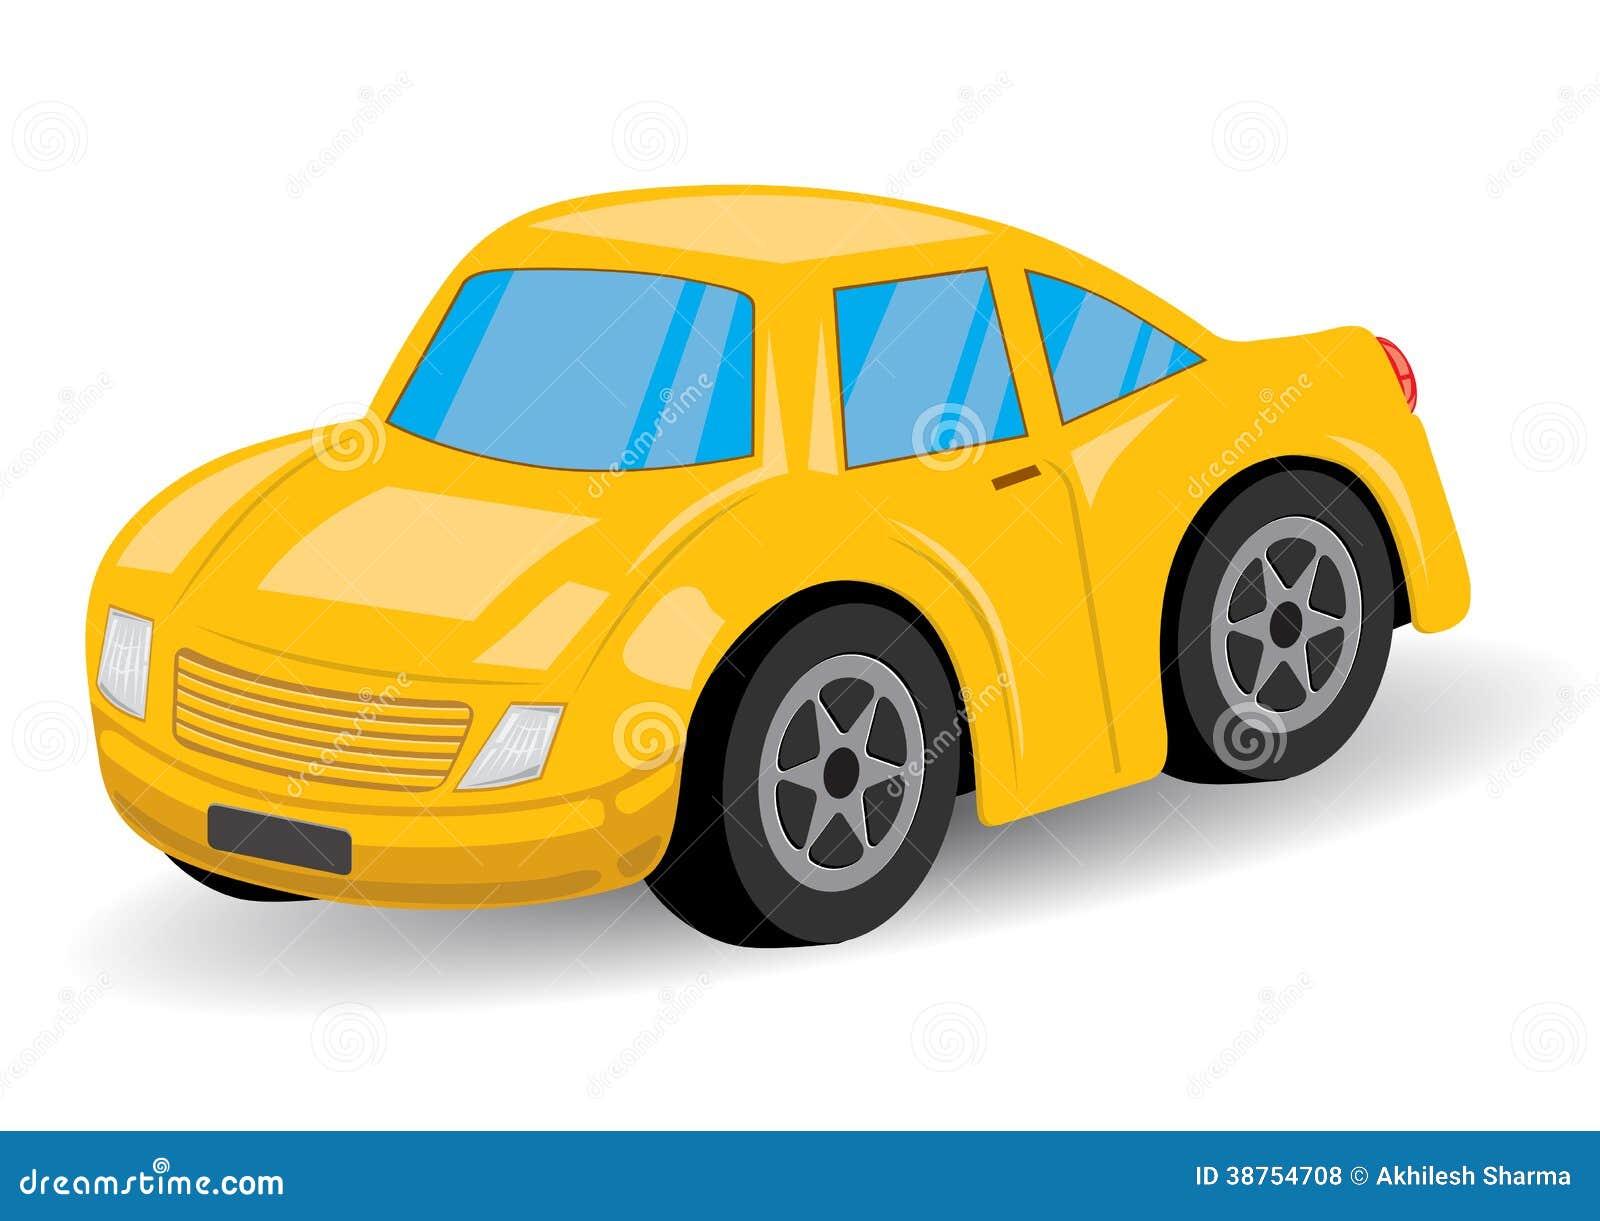 Royalty Free Racing Car